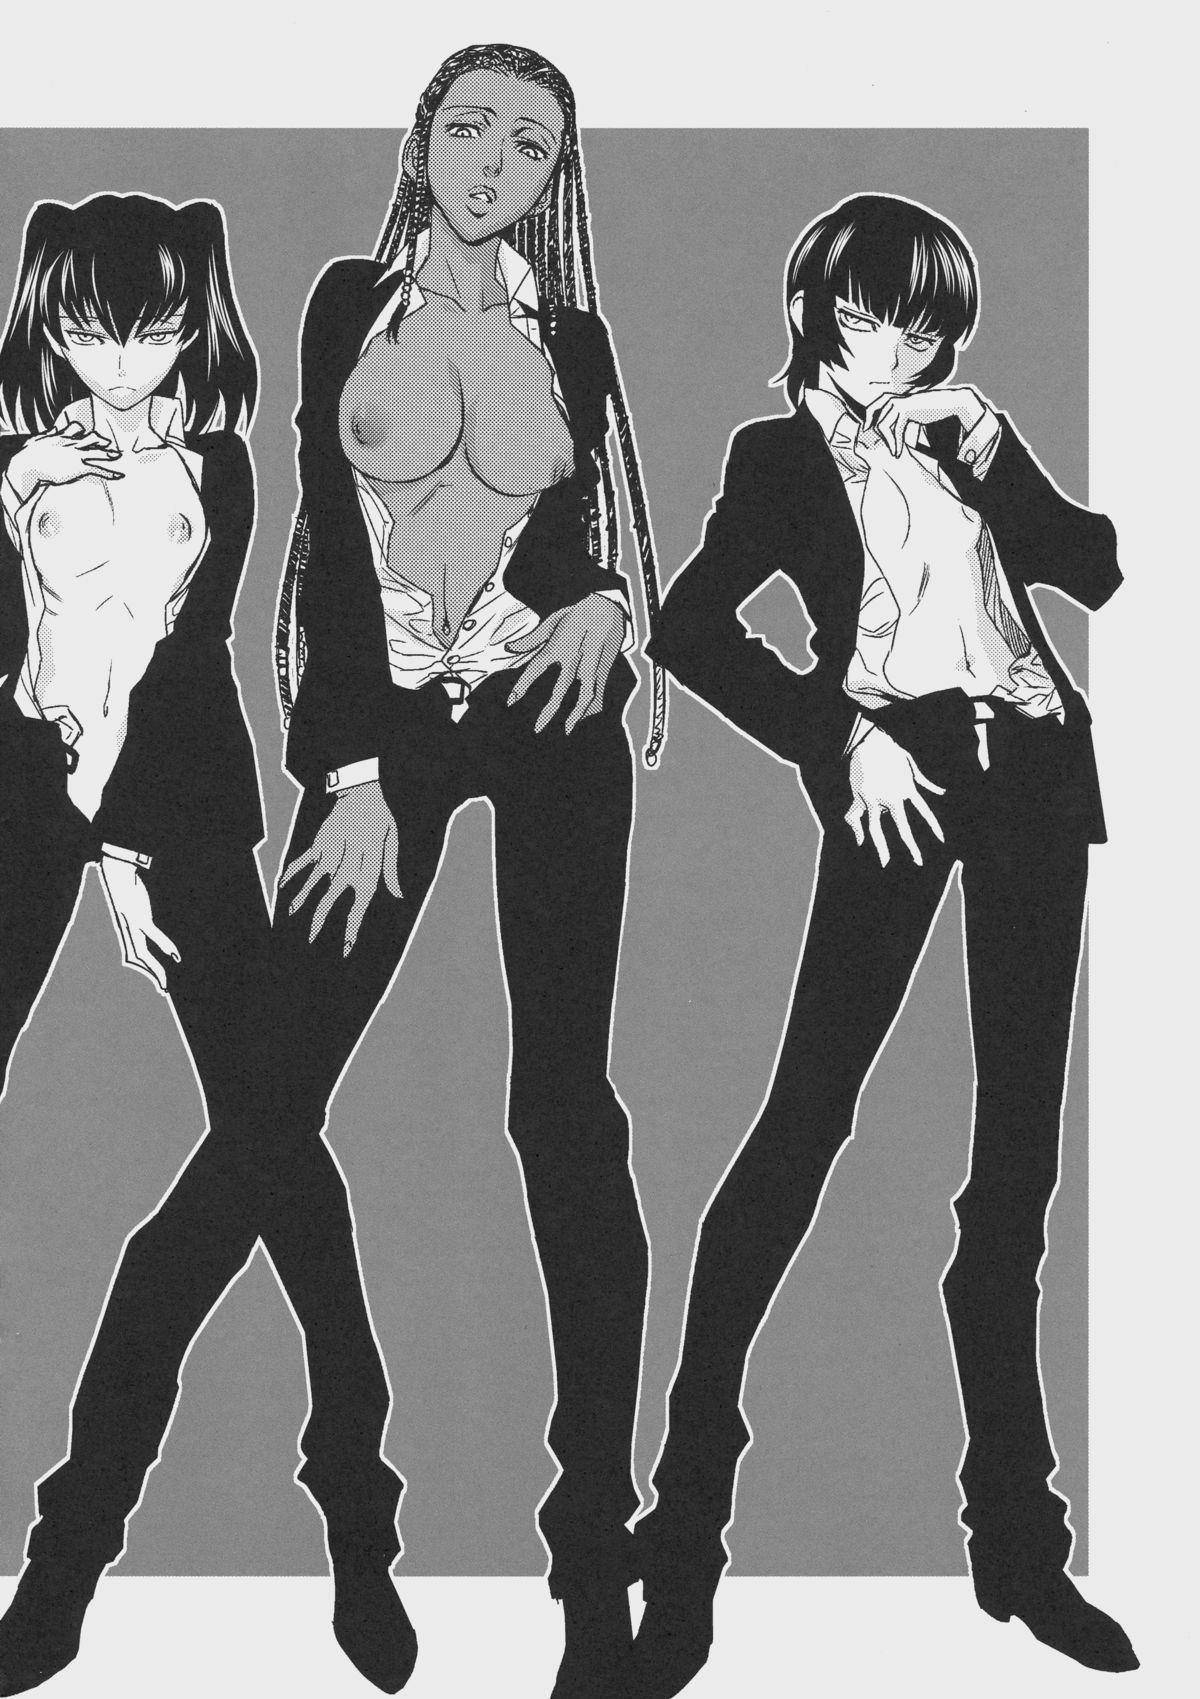 (C88) [TEX-MEX (Red Bear)] Shisei Roku-shiki Doujin - Omakebon (Various) 3